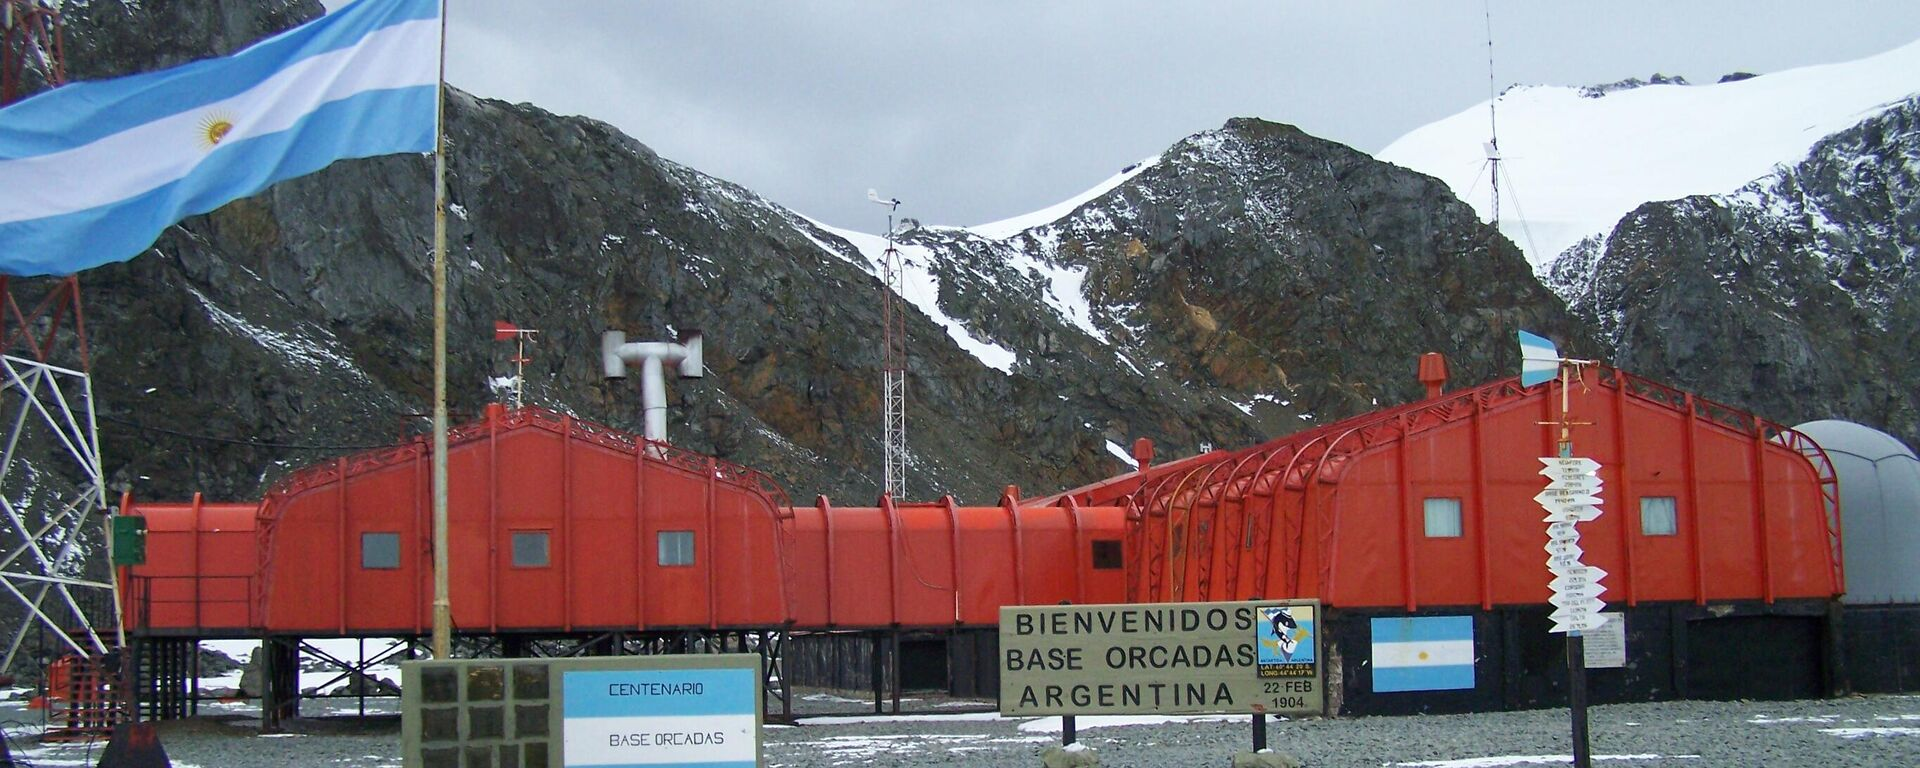 Base Orcadas de Argentina en la Antártida - Sputnik Mundo, 1920, 23.06.2021